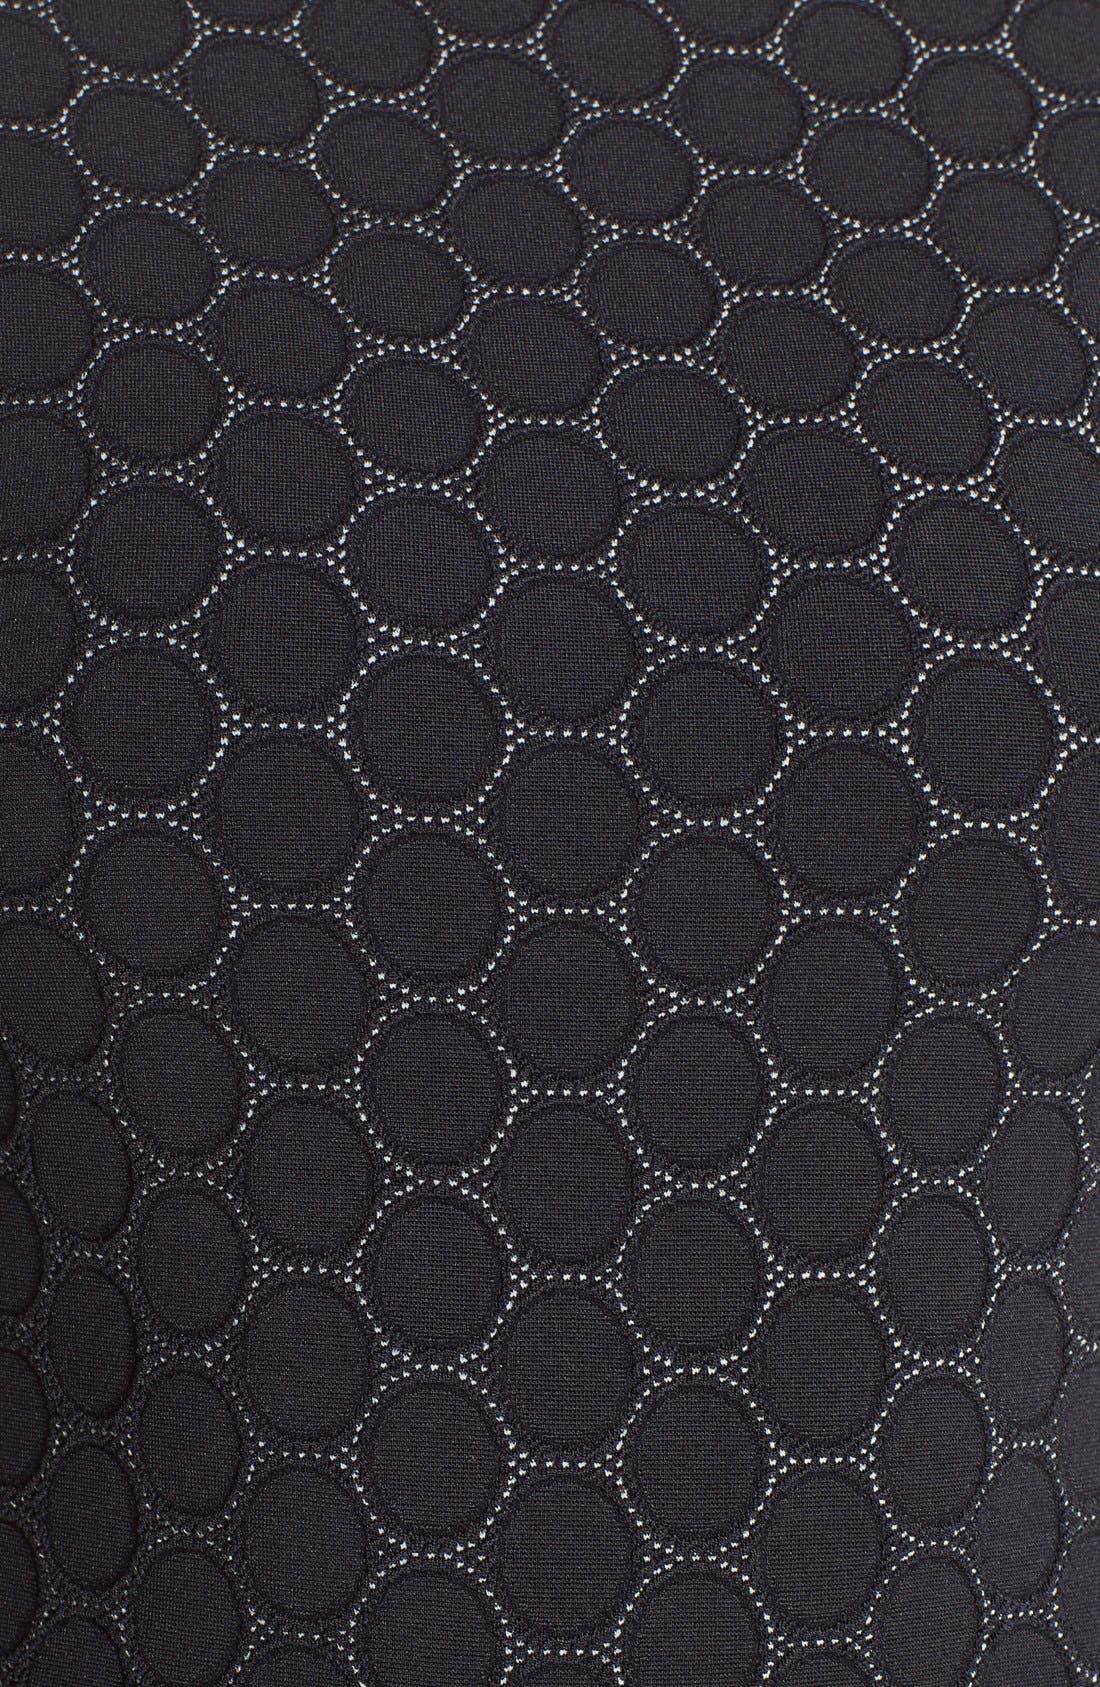 LEOTA, 'Circle' Jacquard Woven Jersey Dress, Alternate thumbnail 5, color, BLACK CAMEO CLOTH